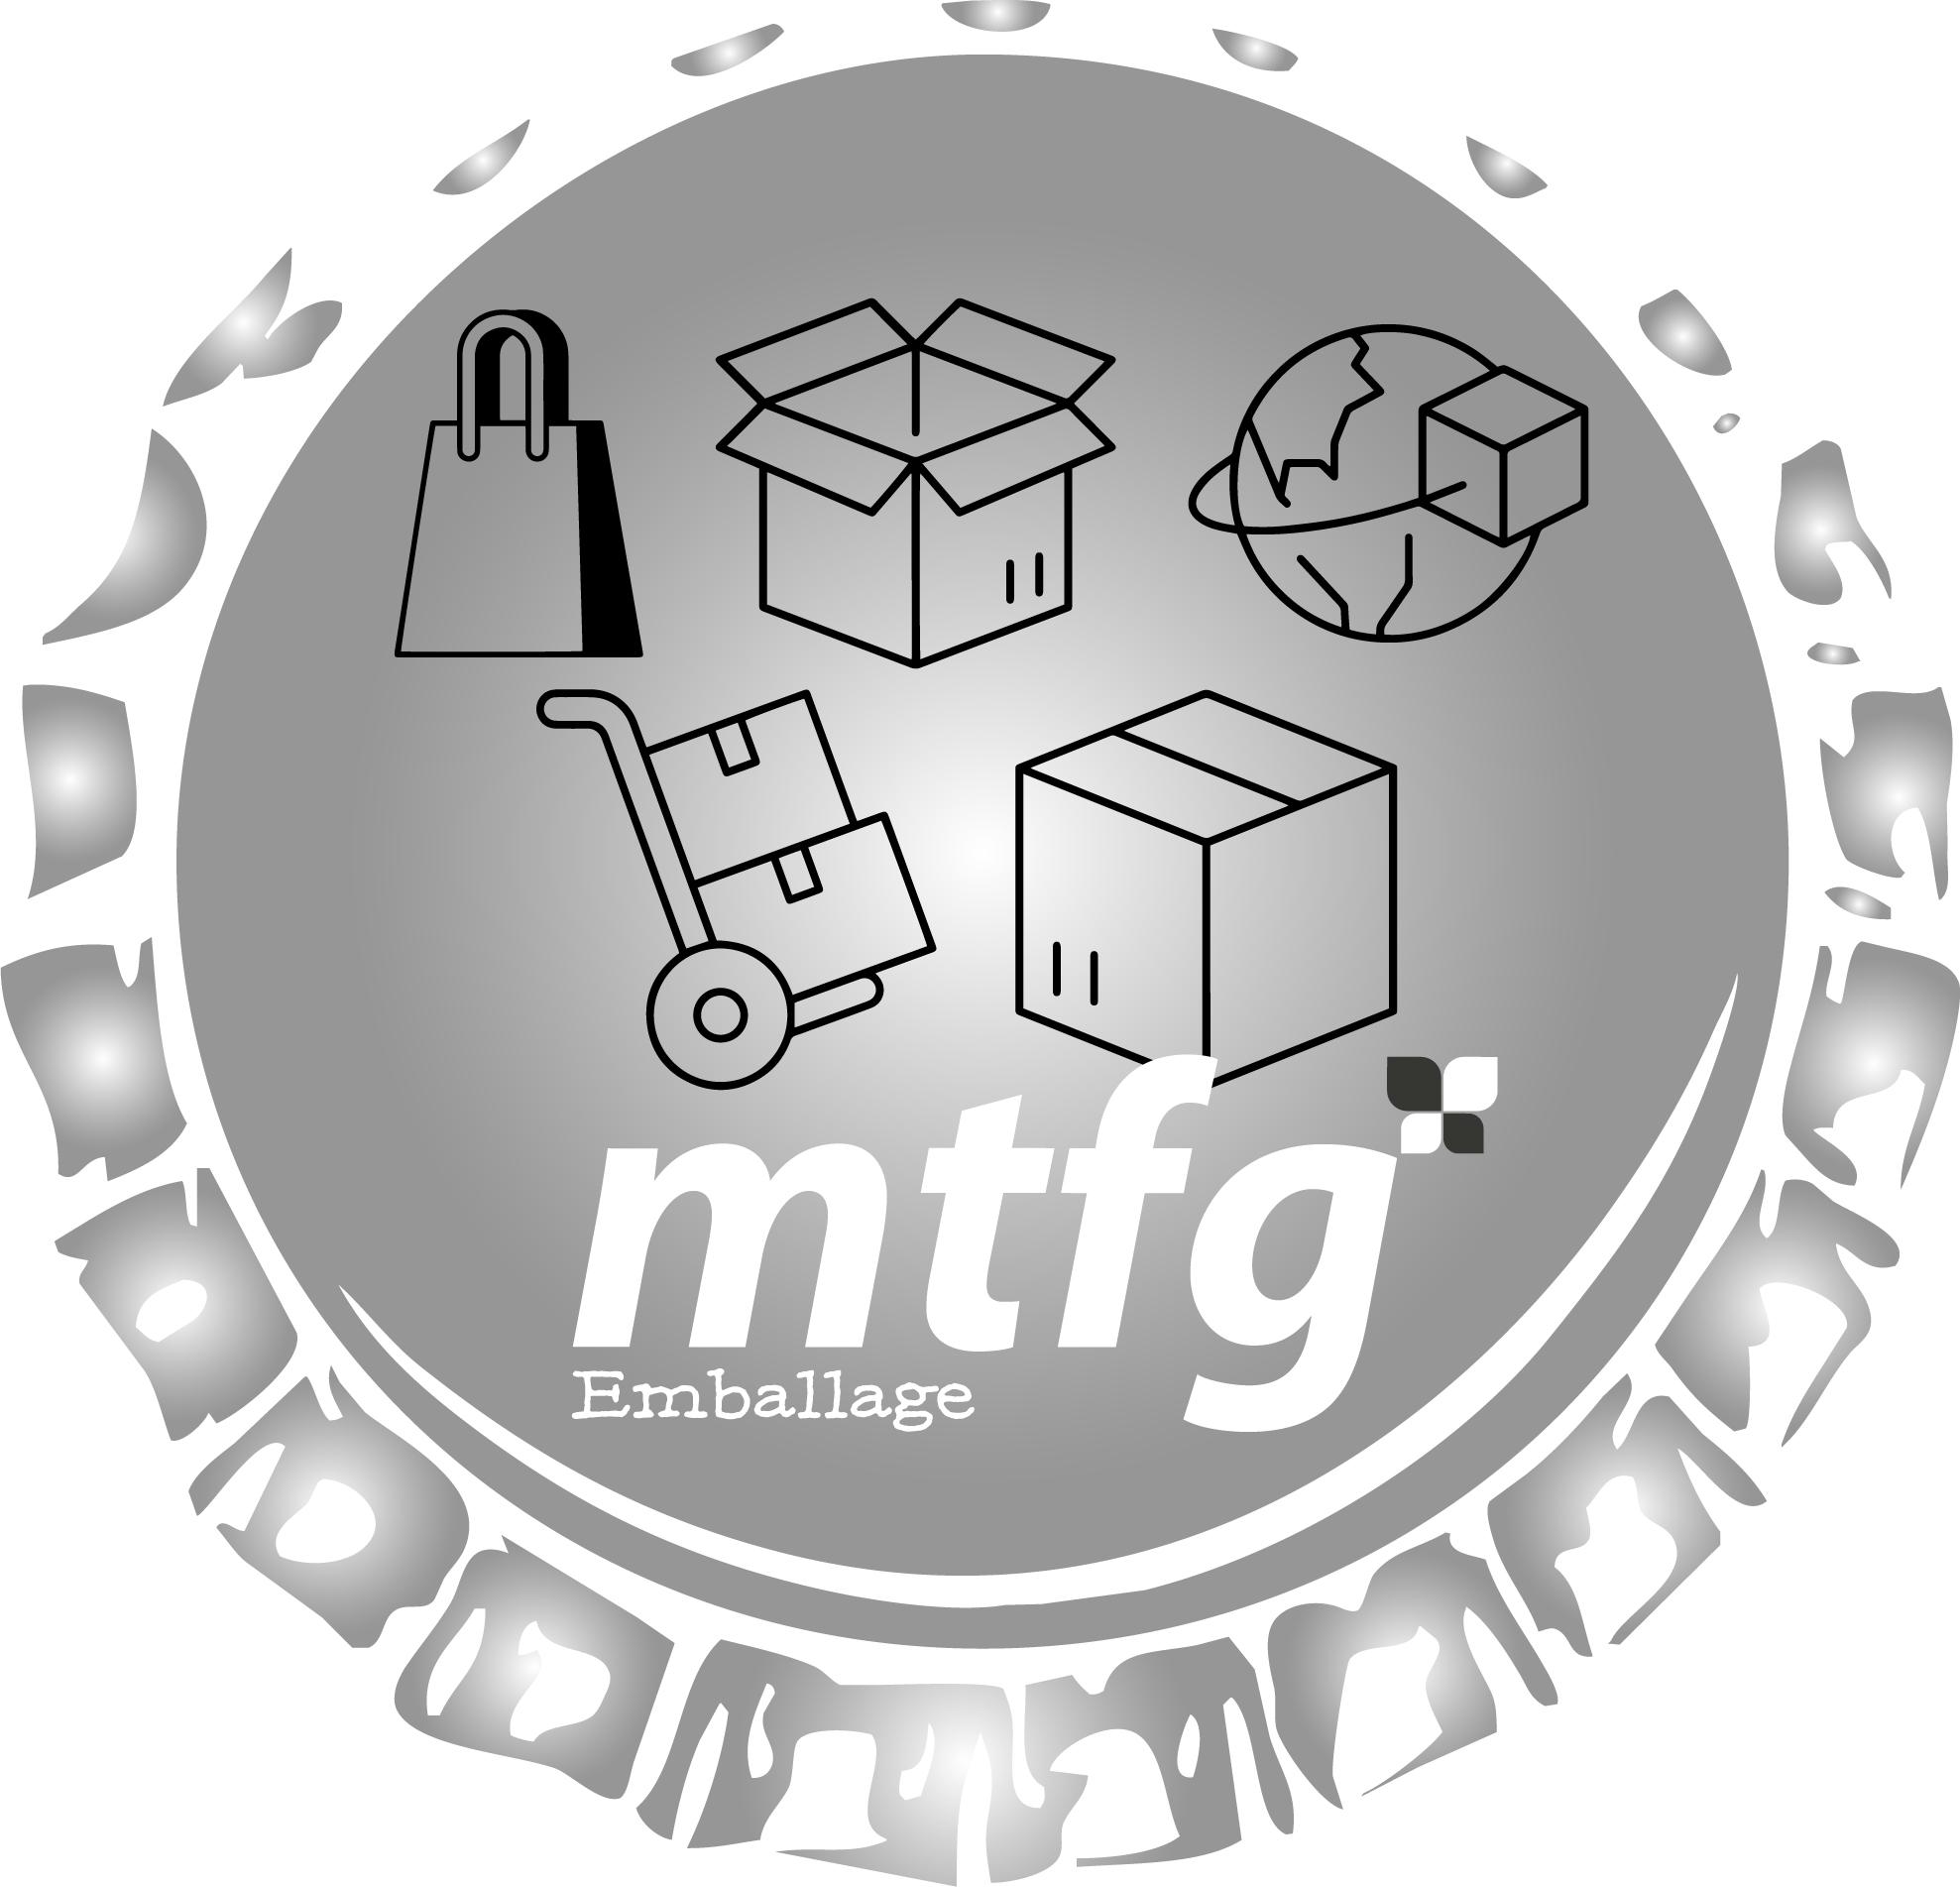 MTFG Emballage